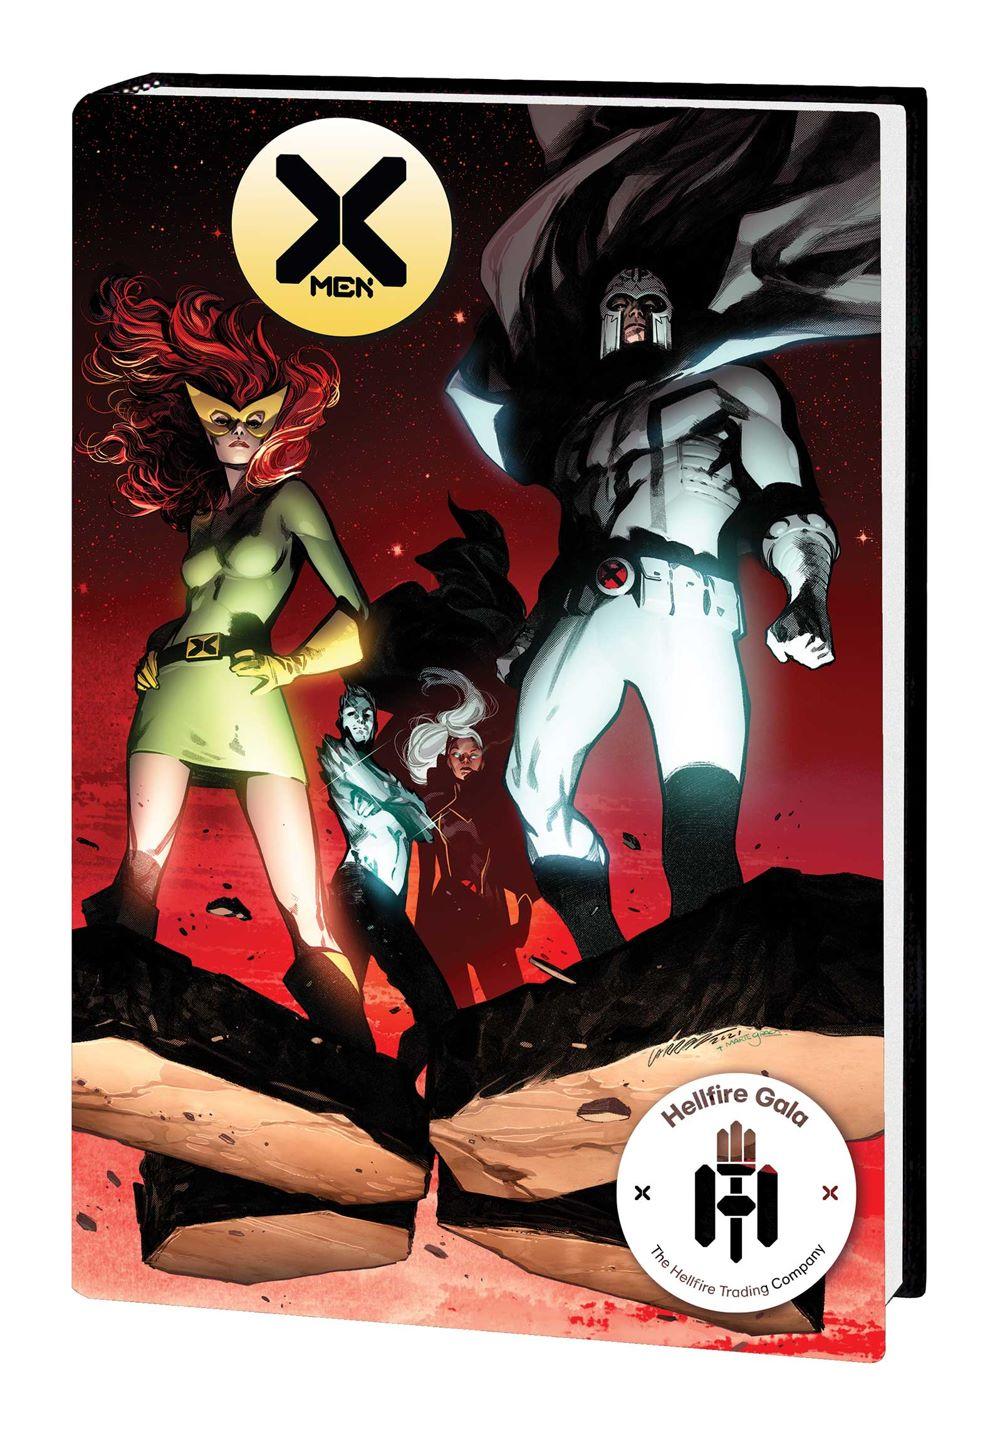 XMEN_HELLFIRE_GALA_HC Marvel Comics August 2021 Solicitations